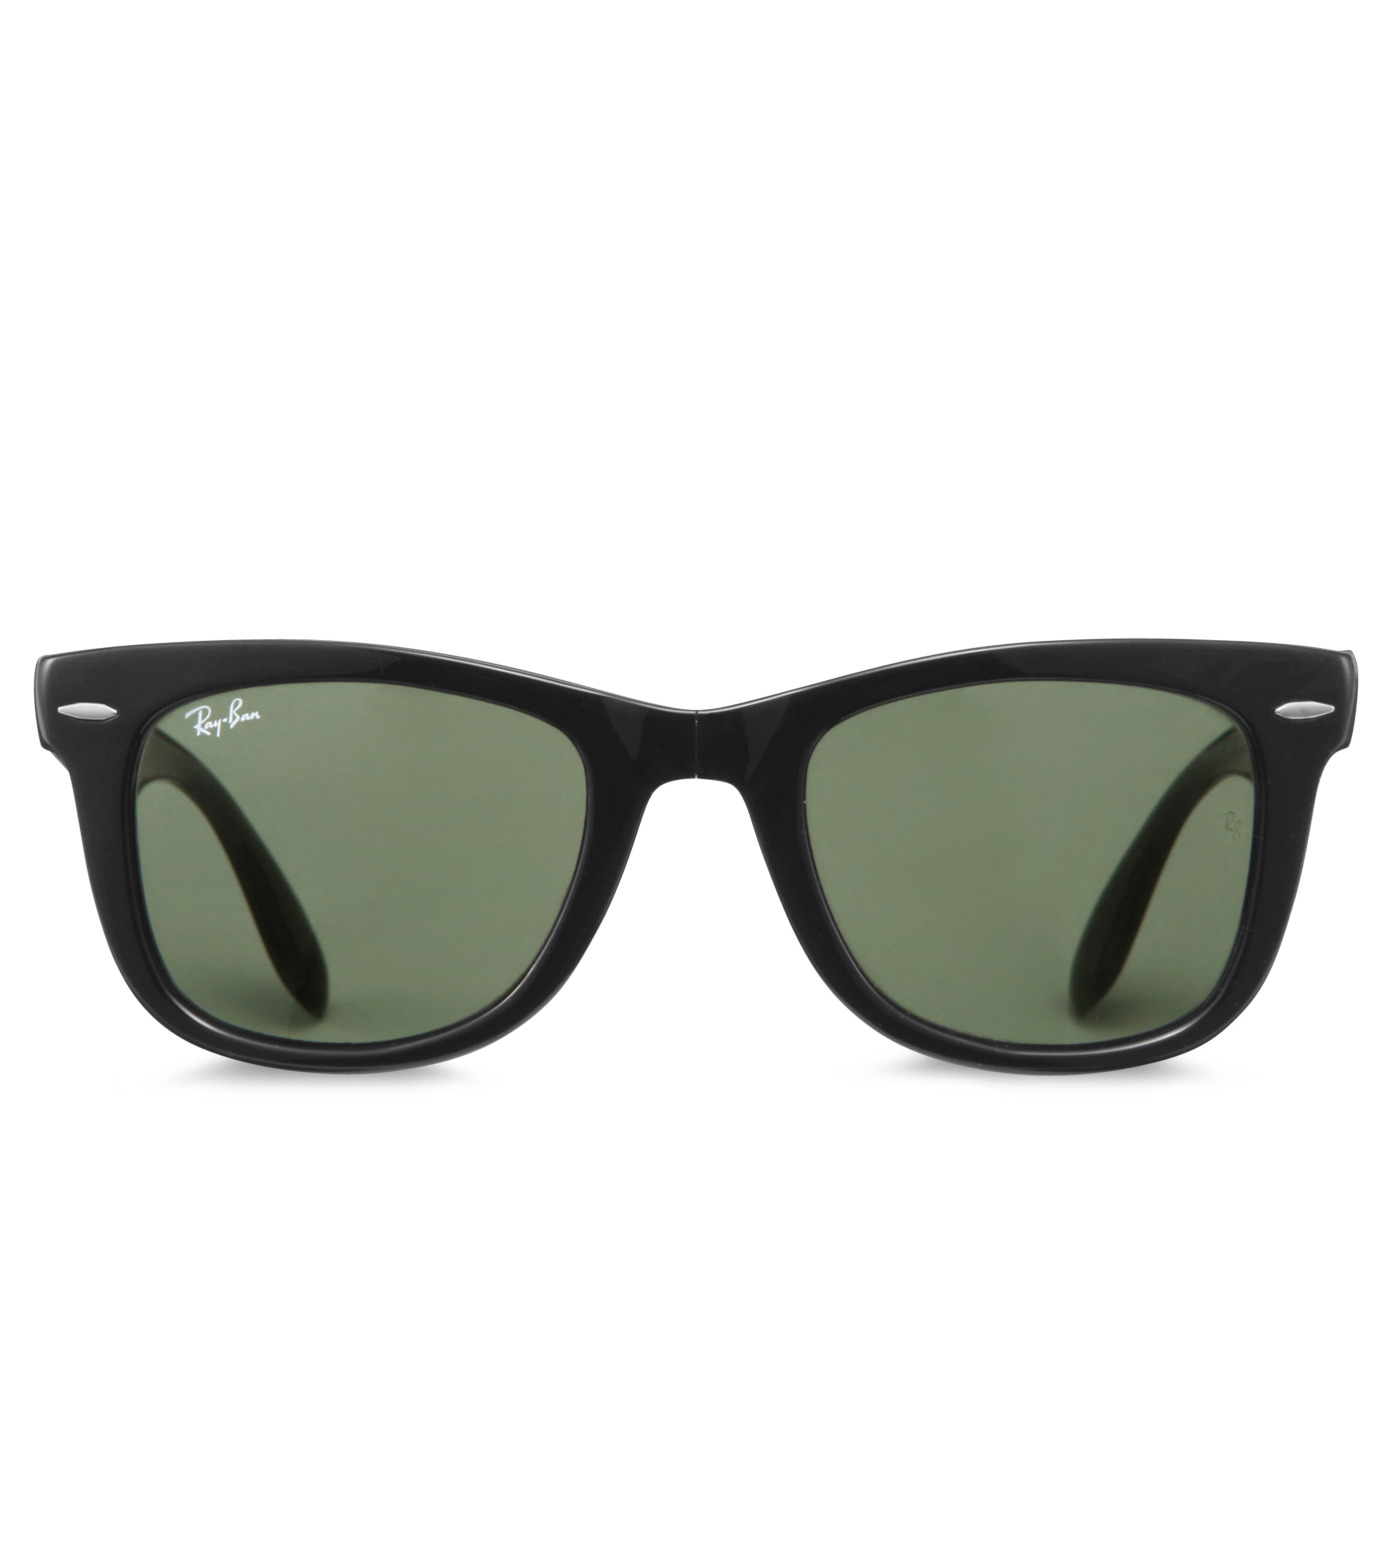 Ray-Ban(レイバン)のWayfarer Normal Black-BLACK(アイウェア/eyewear)-BR-4105-13 拡大詳細画像3